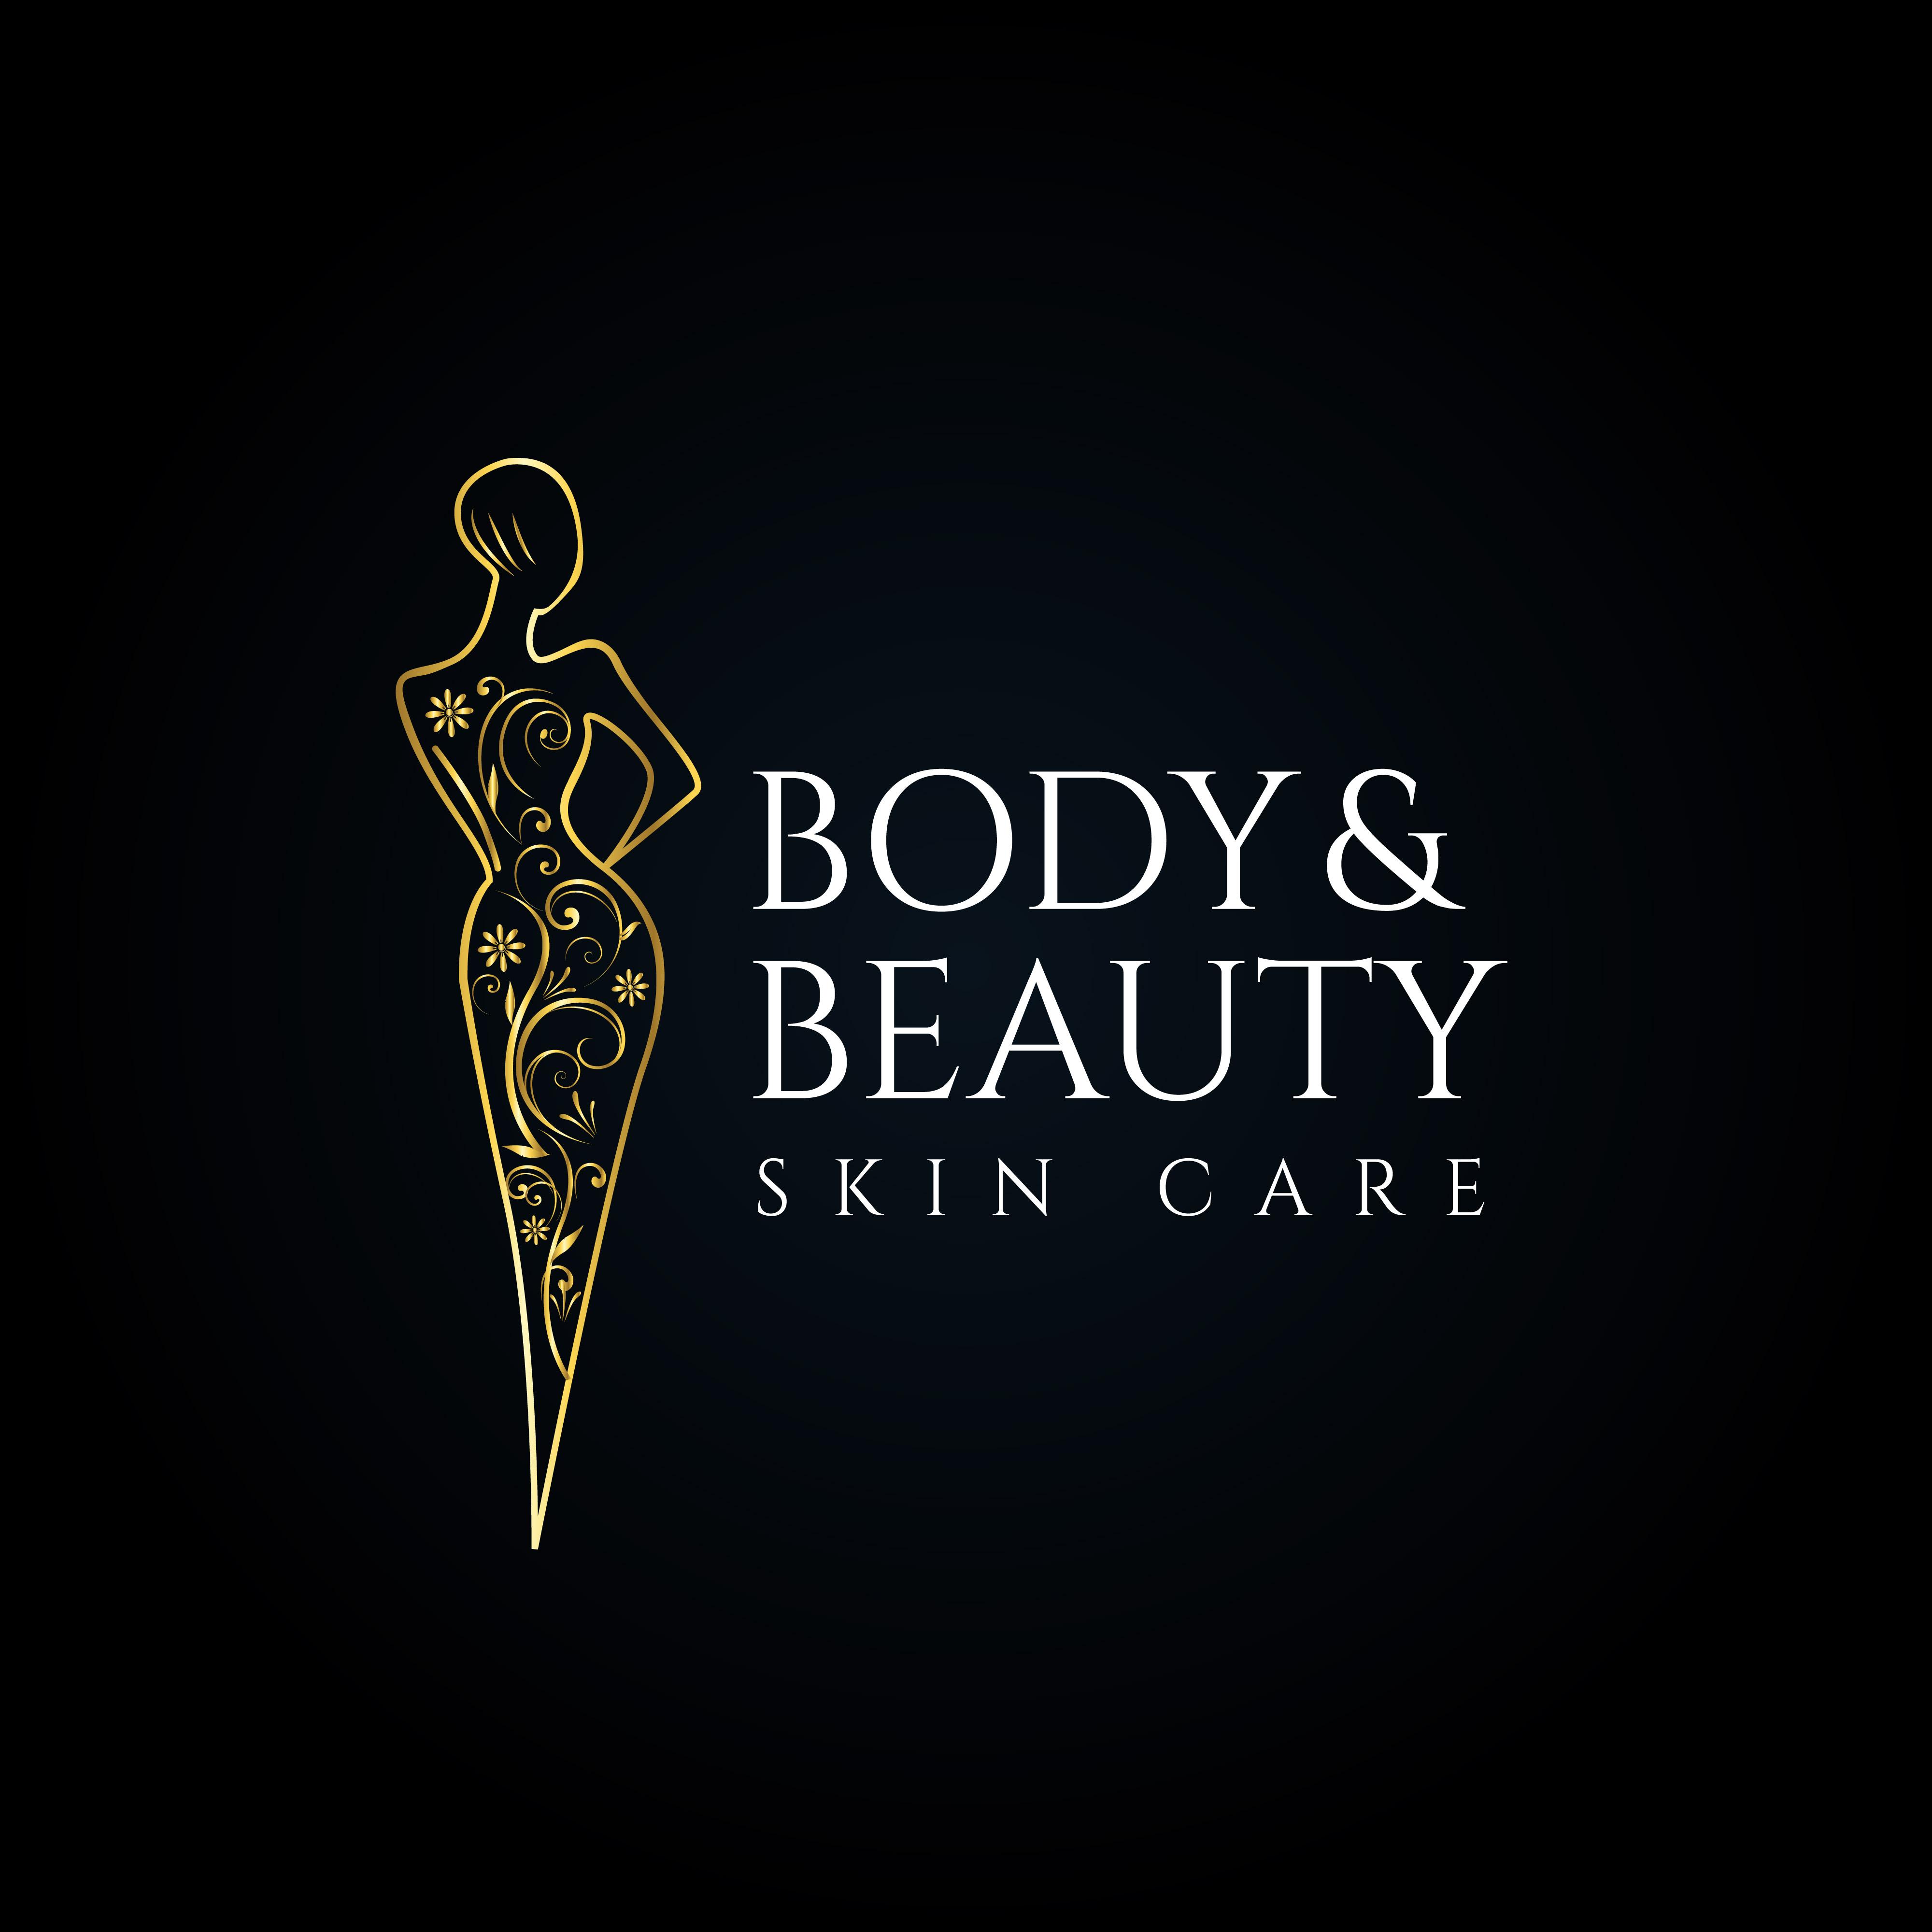 Beauty Salon Skin Care Logo Download Free Vectors Clipart Graphics Vector Art